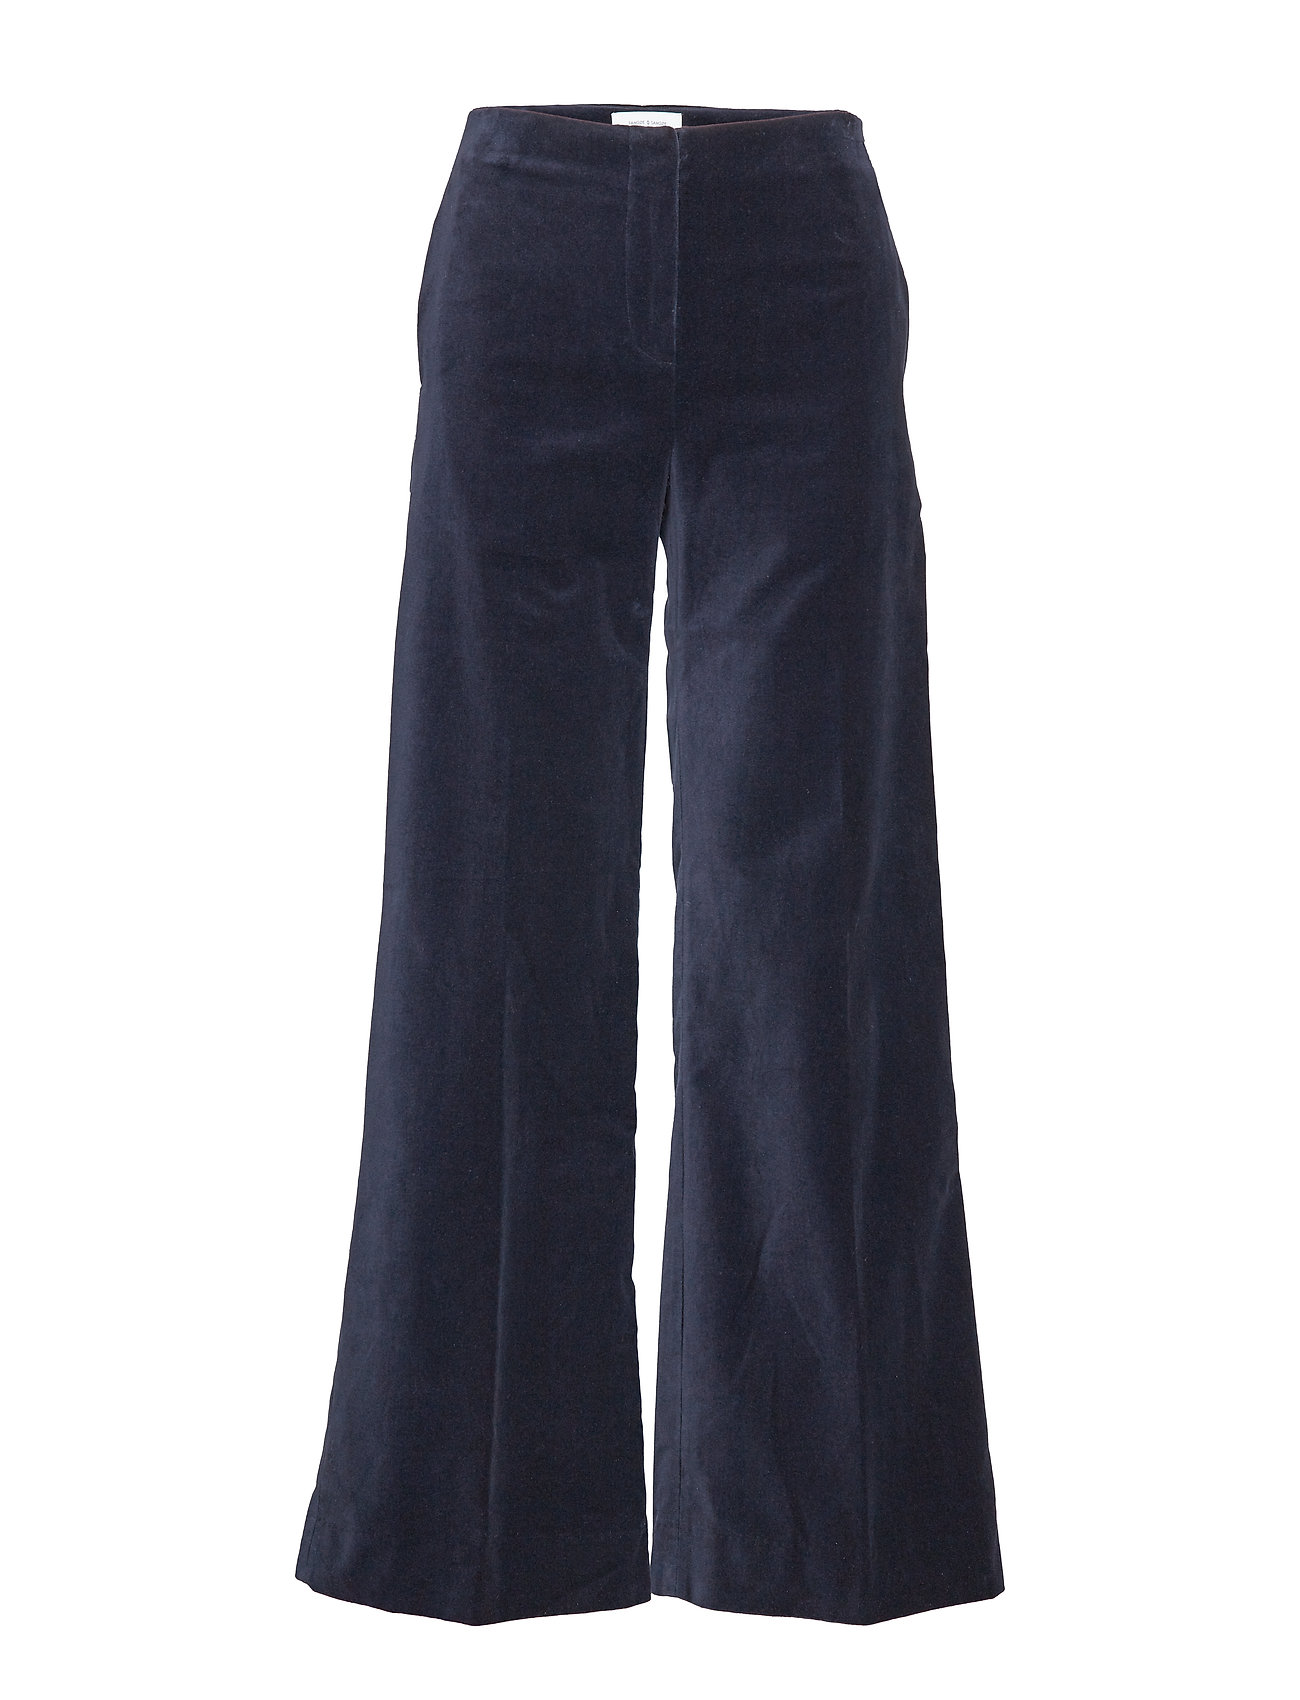 Samsøe & Samsøe Caren trousers 11114 - NIGHT SKY